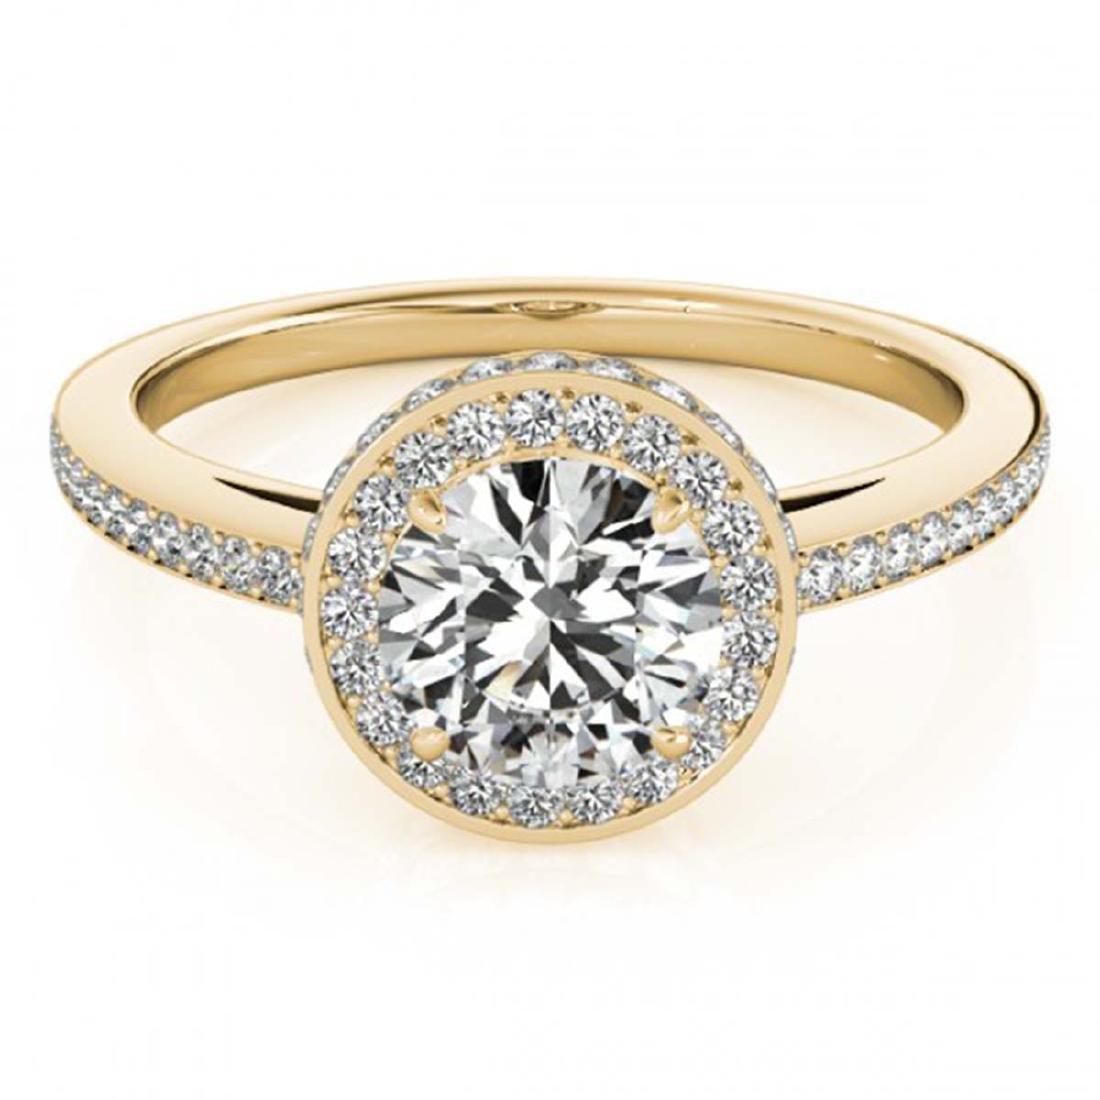 1.25 ctw VS/SI Diamond Solitaire Halo Ring 14K Yellow